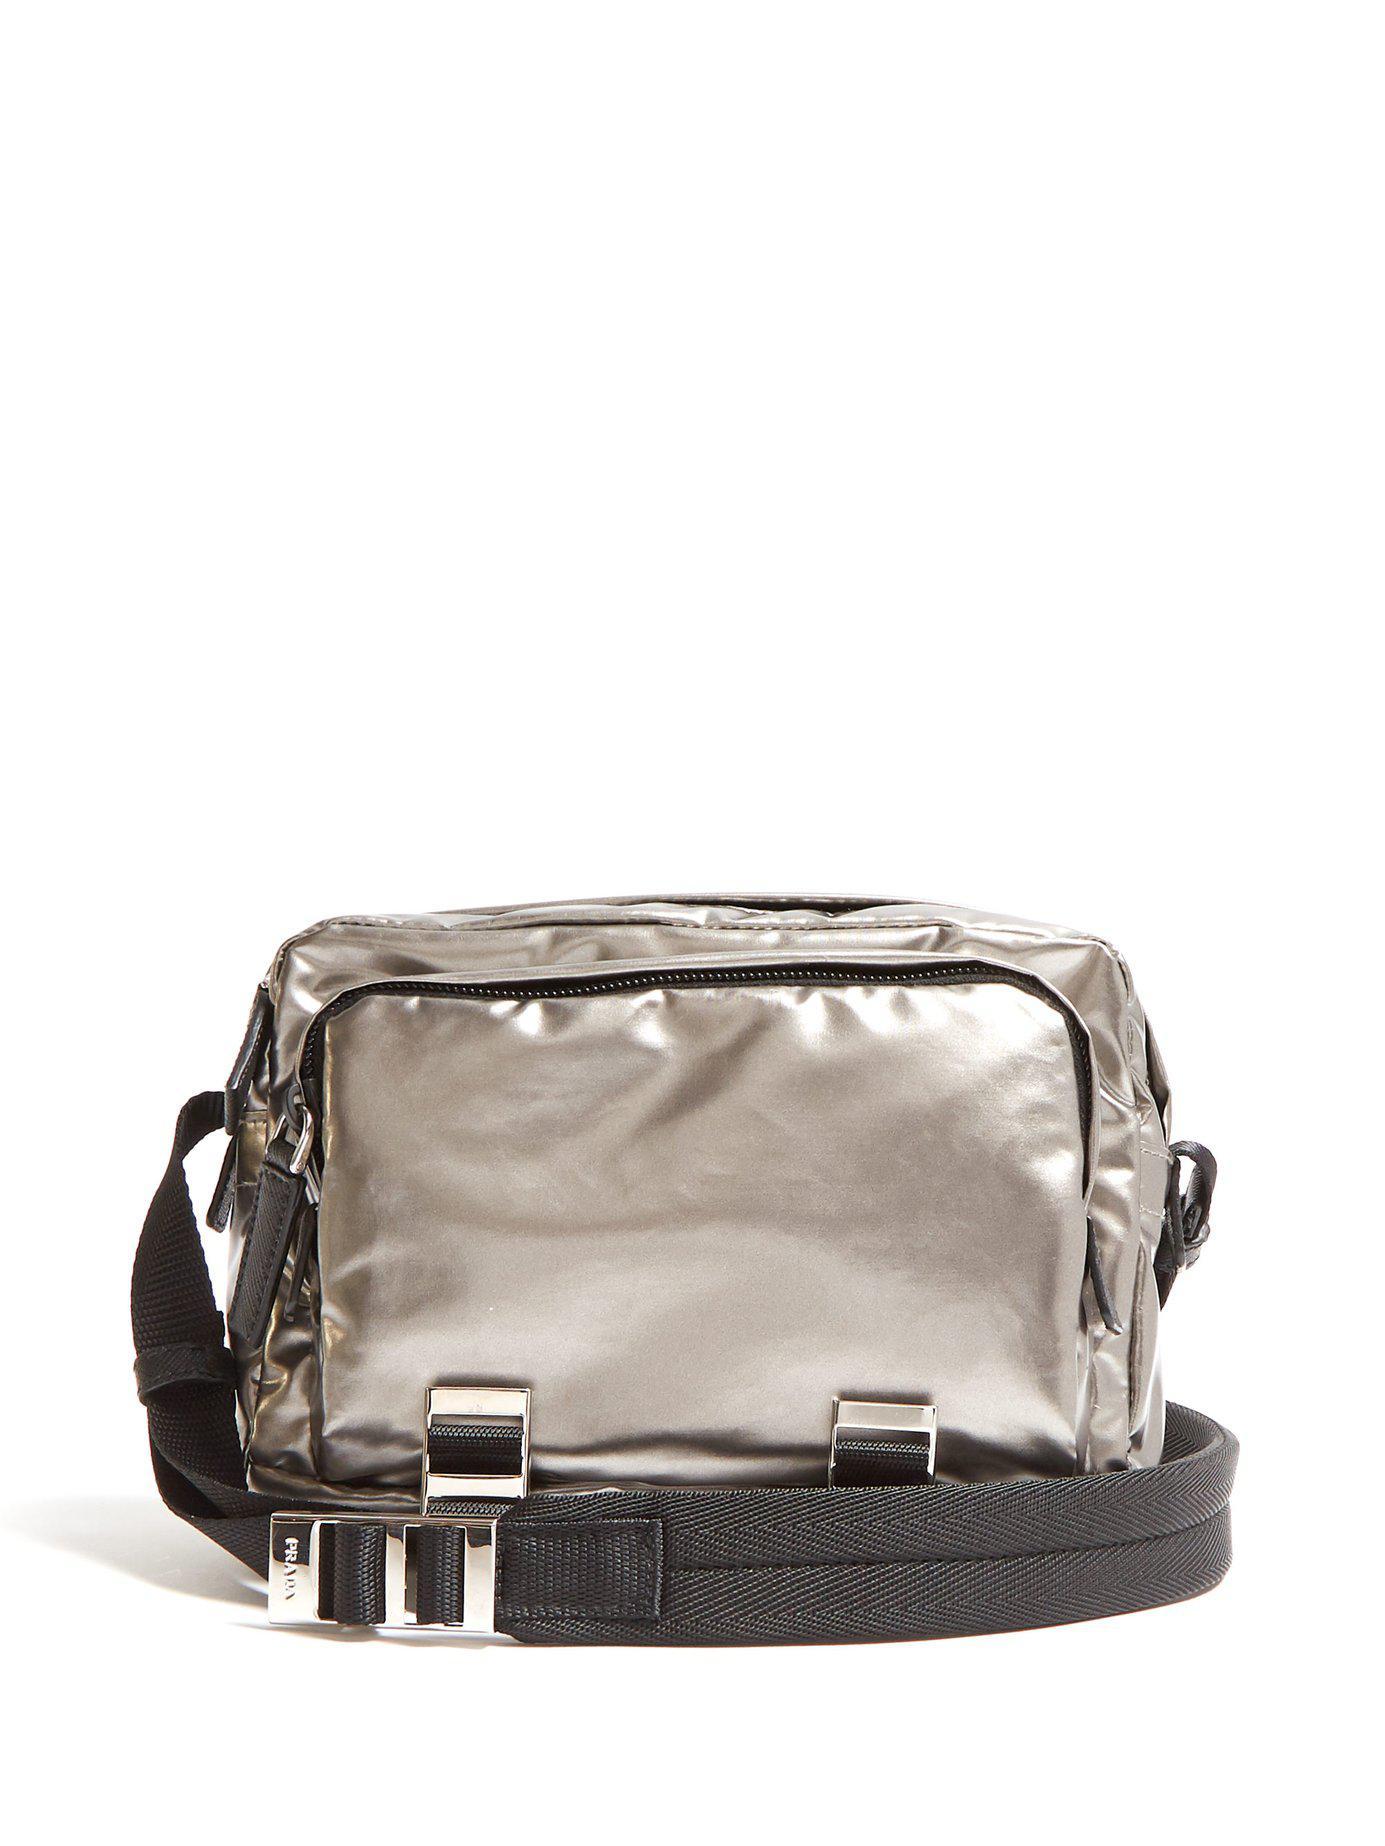 85011091f915 Lyst - Prada Metallic Nylon Cross Body Bag in Metallic for Men